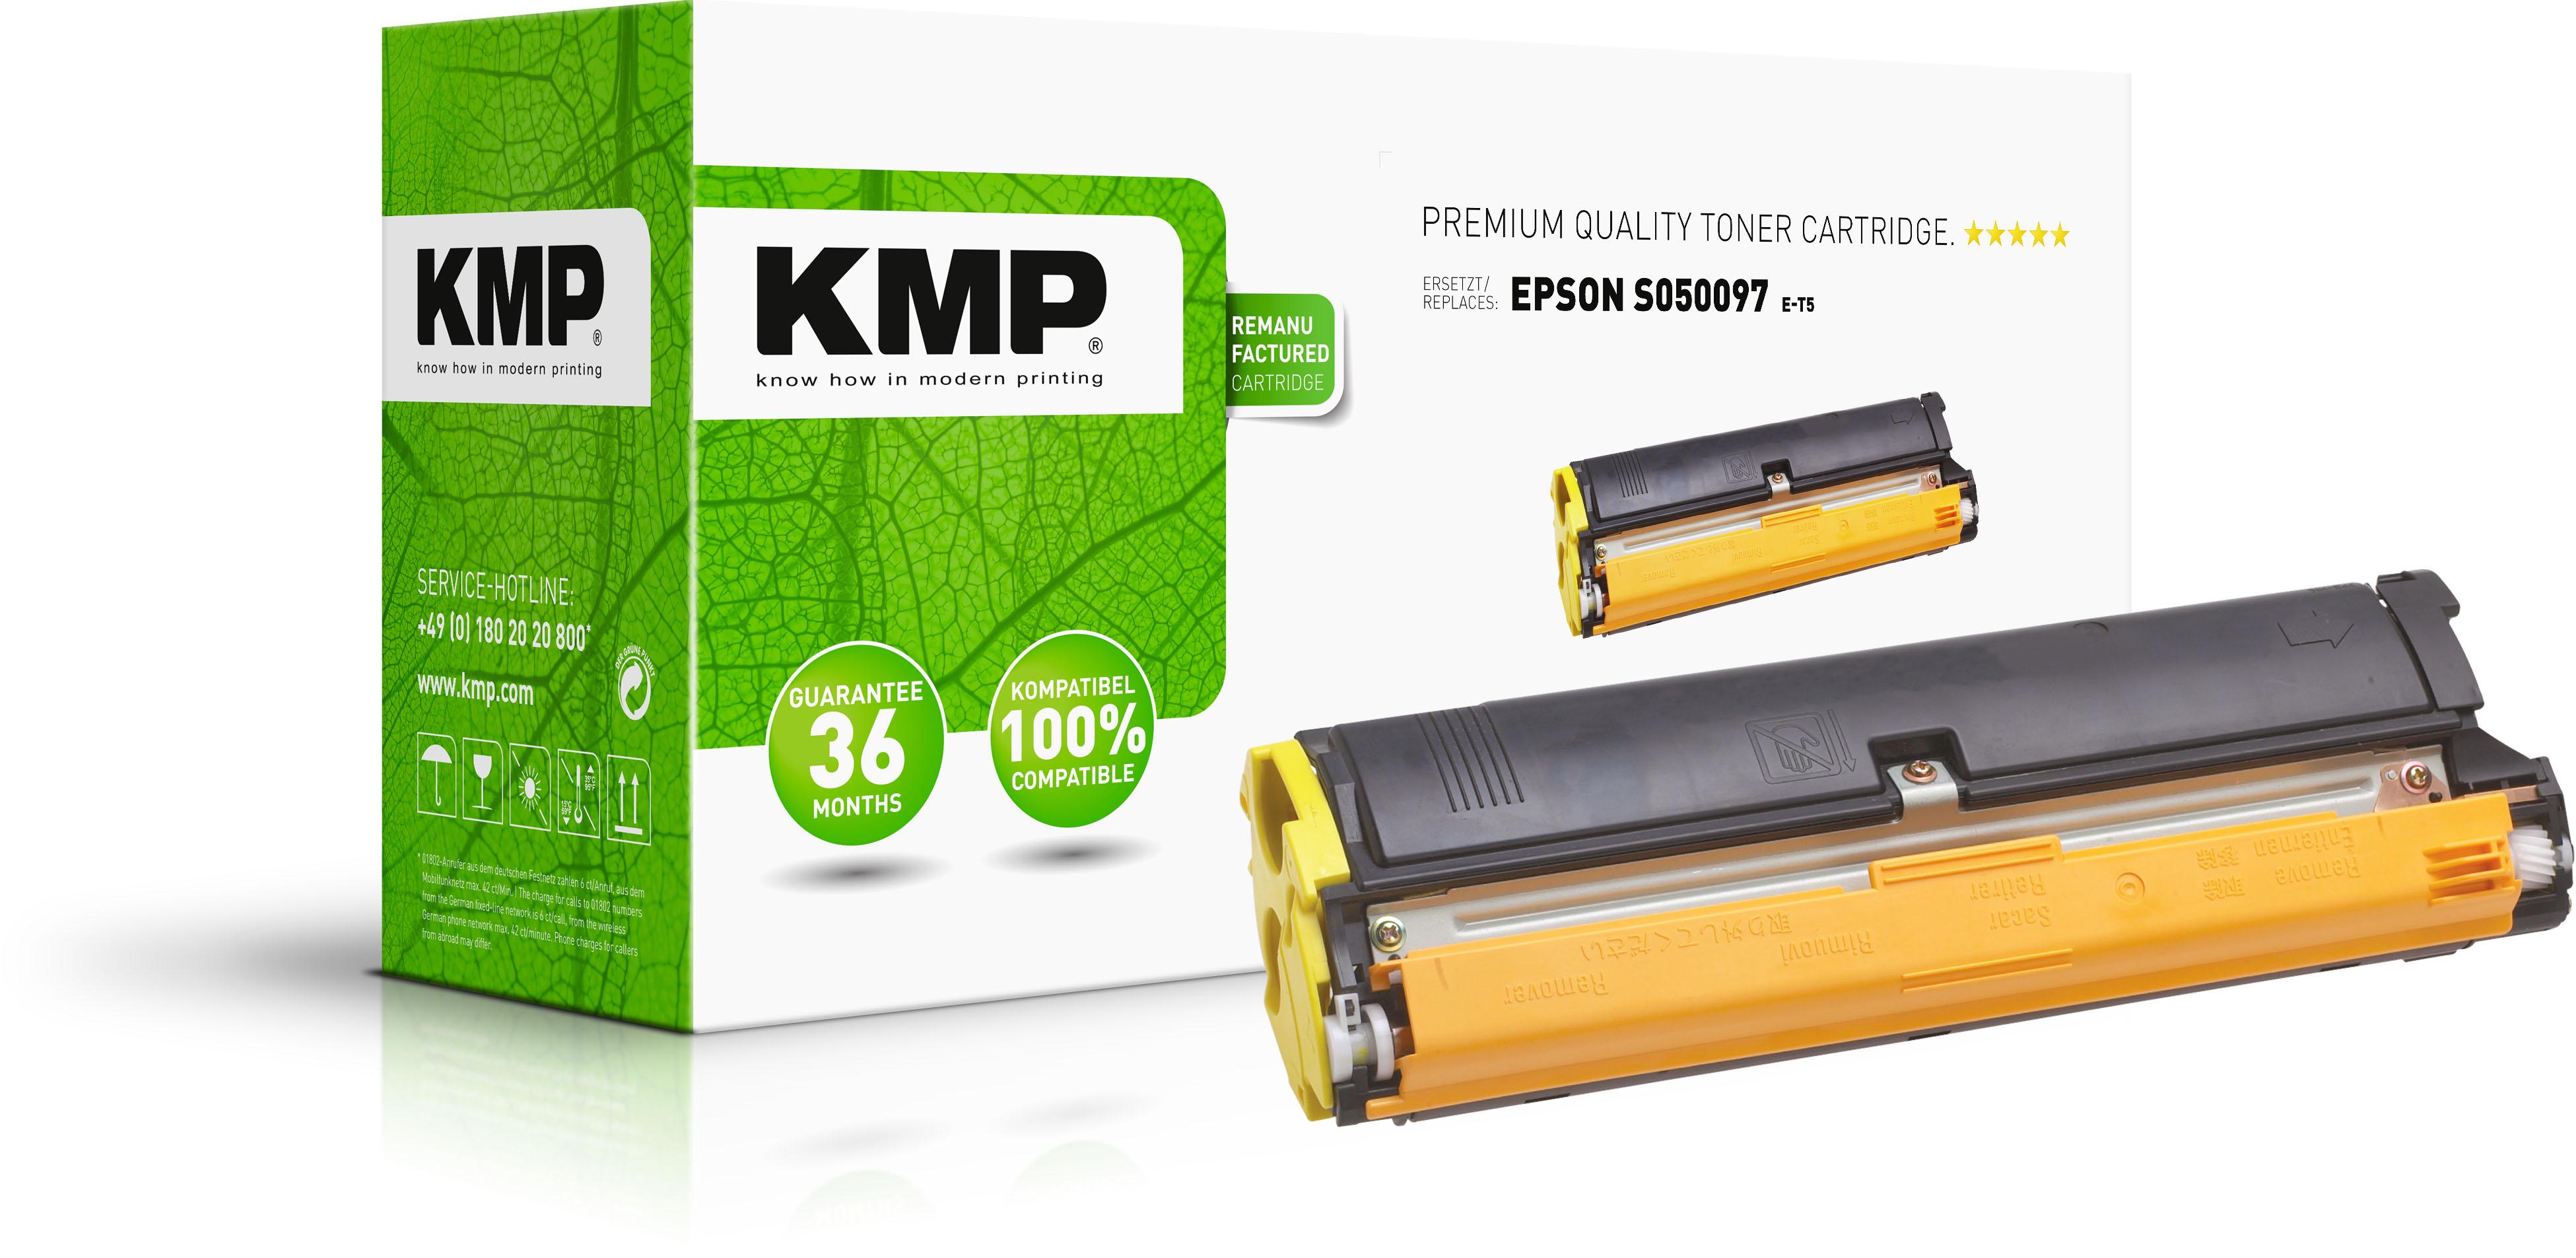 KMP Toner-Kartusche gelb HC (1181,0009, E-T5)